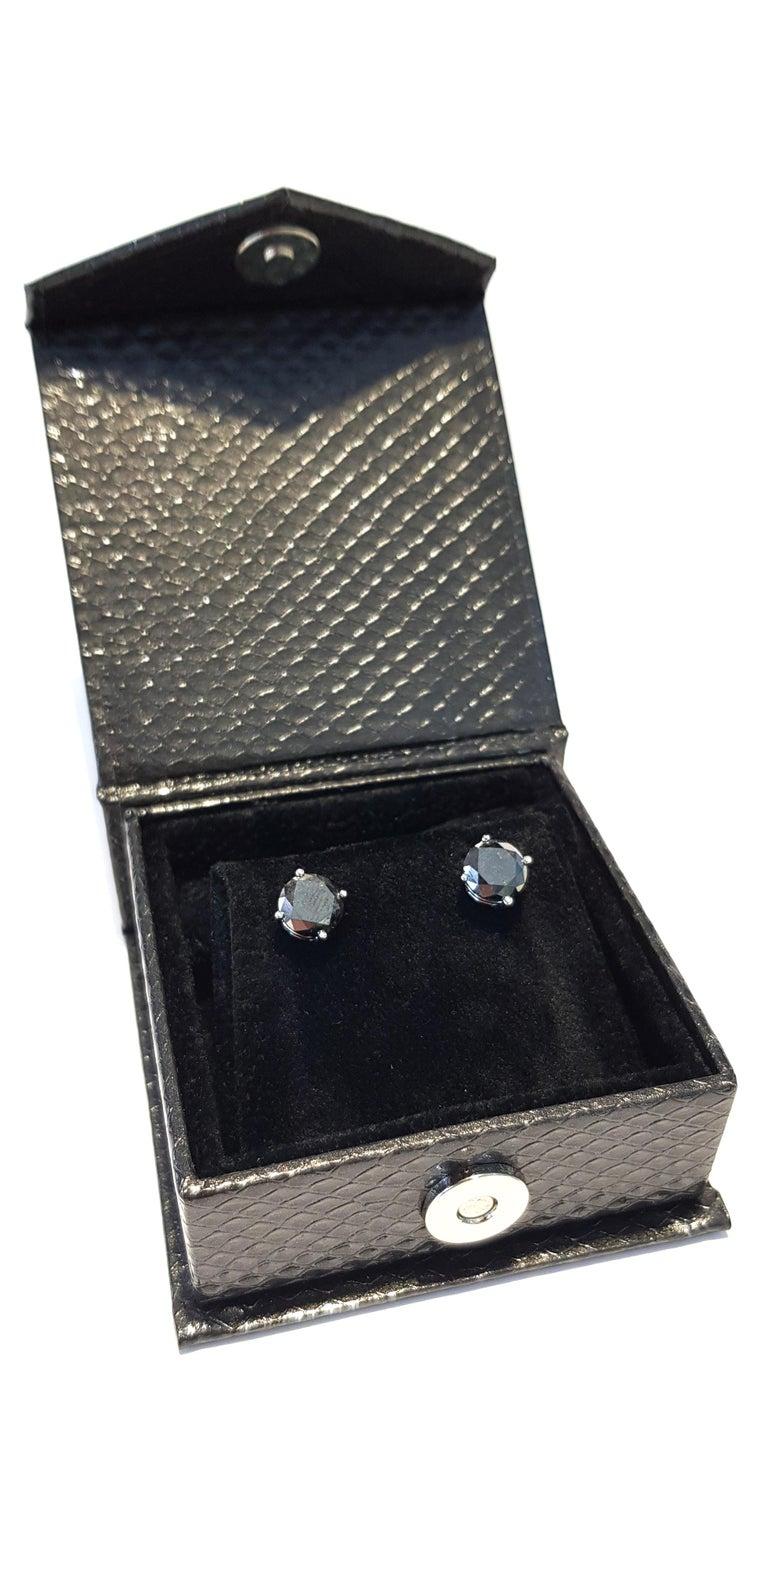 4.57 Carat Black Diamond 18 KT White Gold Solitaire Tresor Paris Stud Earrings  For Sale 4